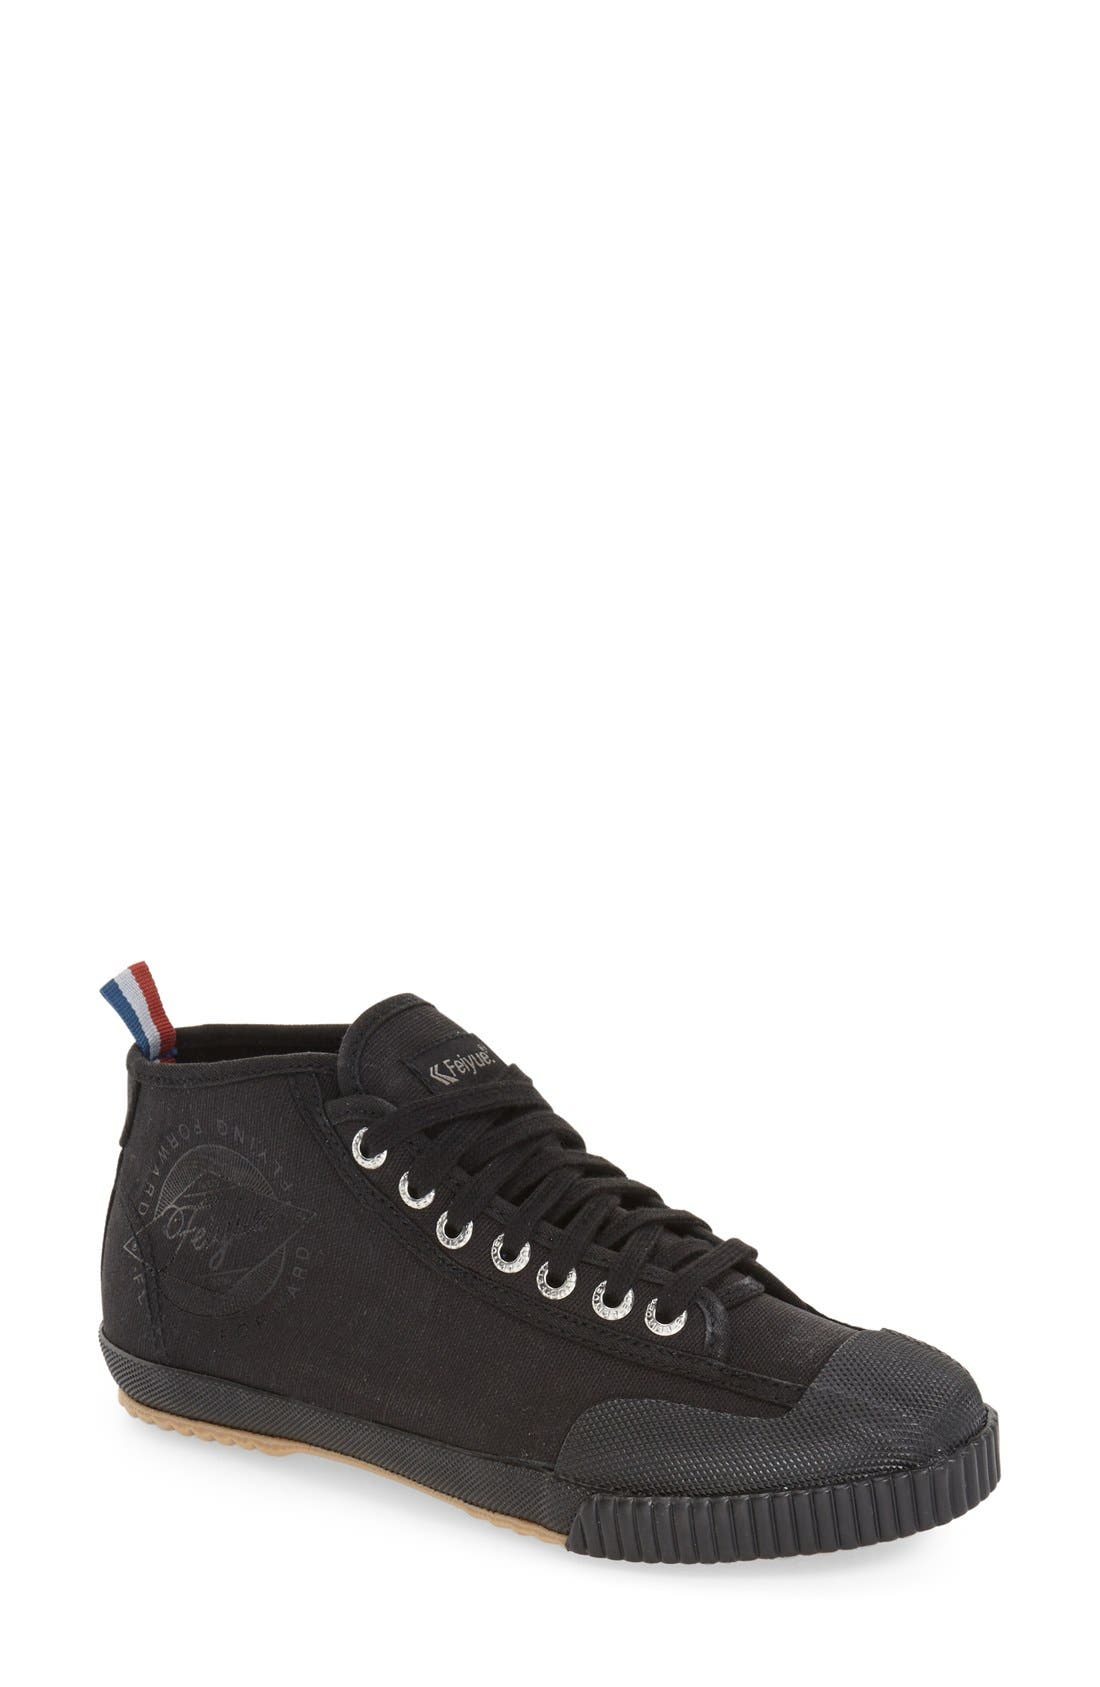 Feiyue. 'Fe Hi Vintage Classic' Sneaker (Women)